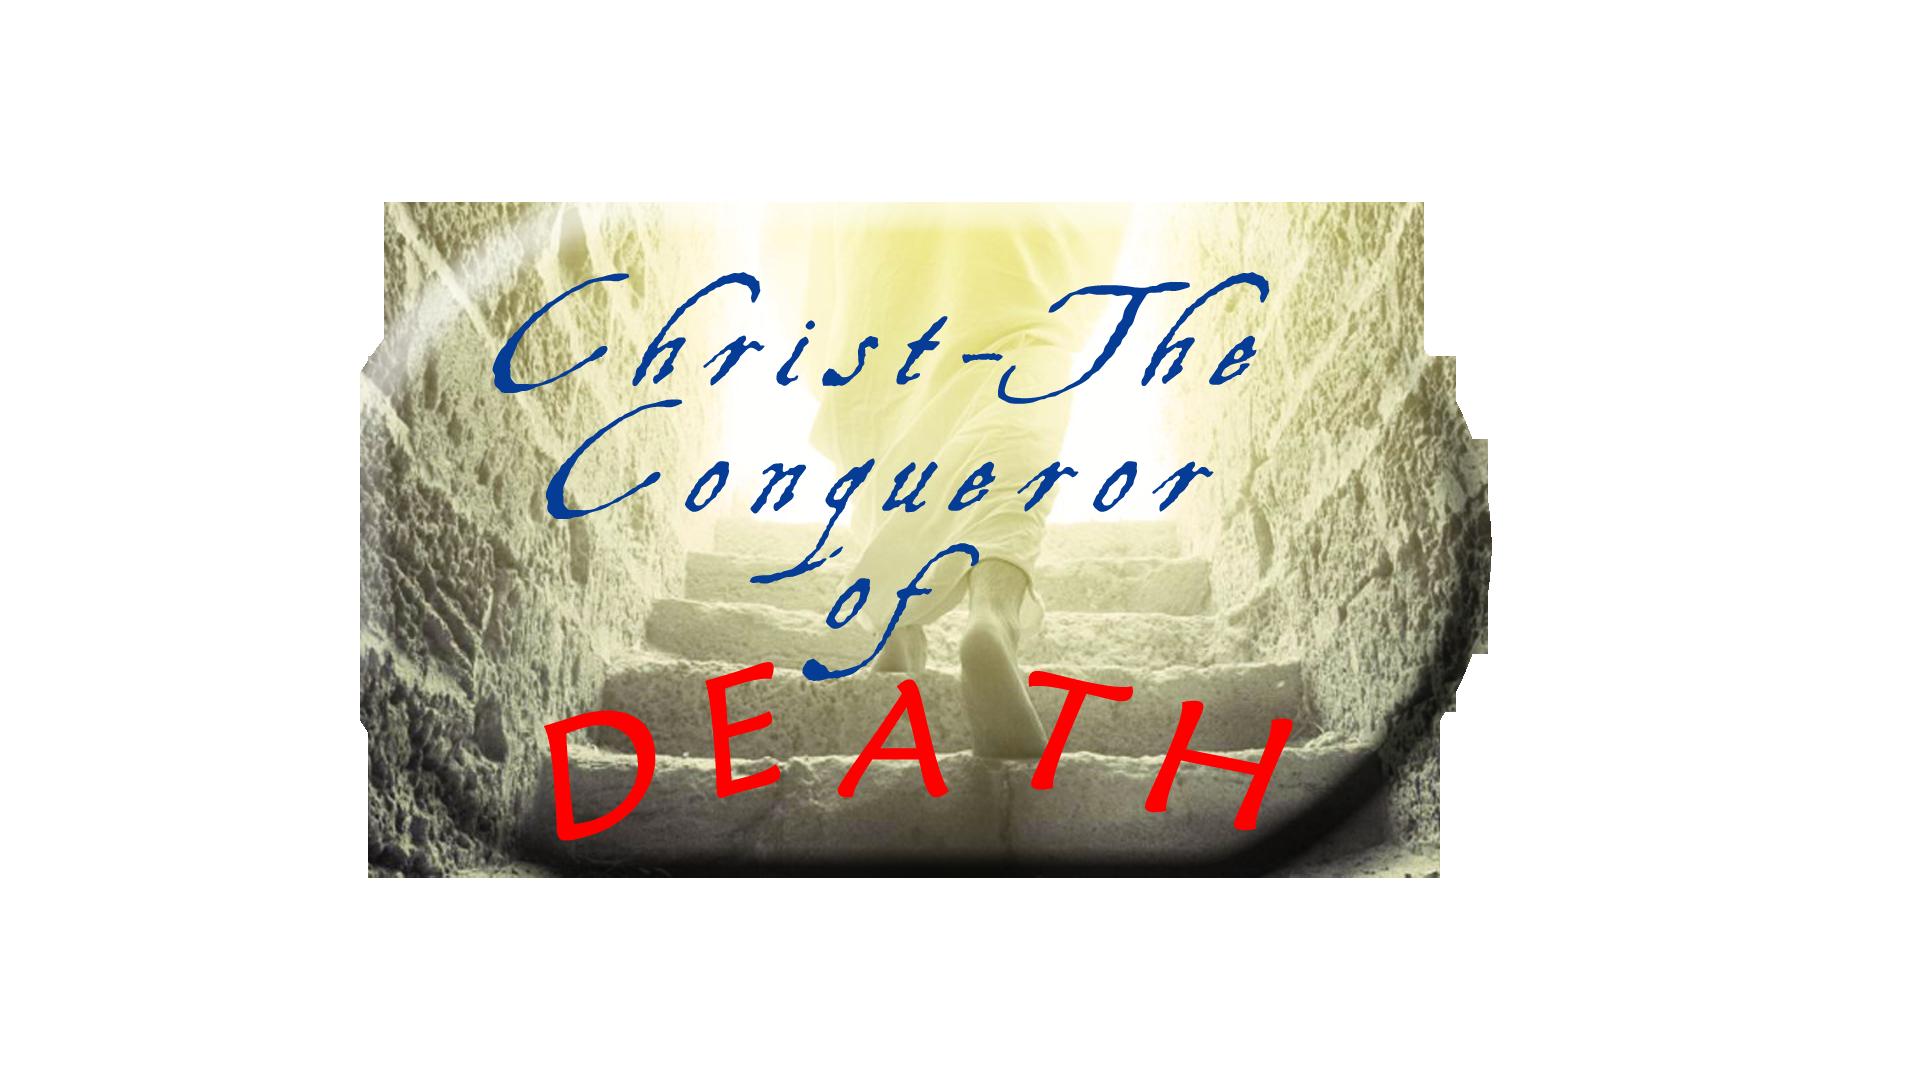 CHRIST THE CONQUEROR OF DEATH (7-1-18)